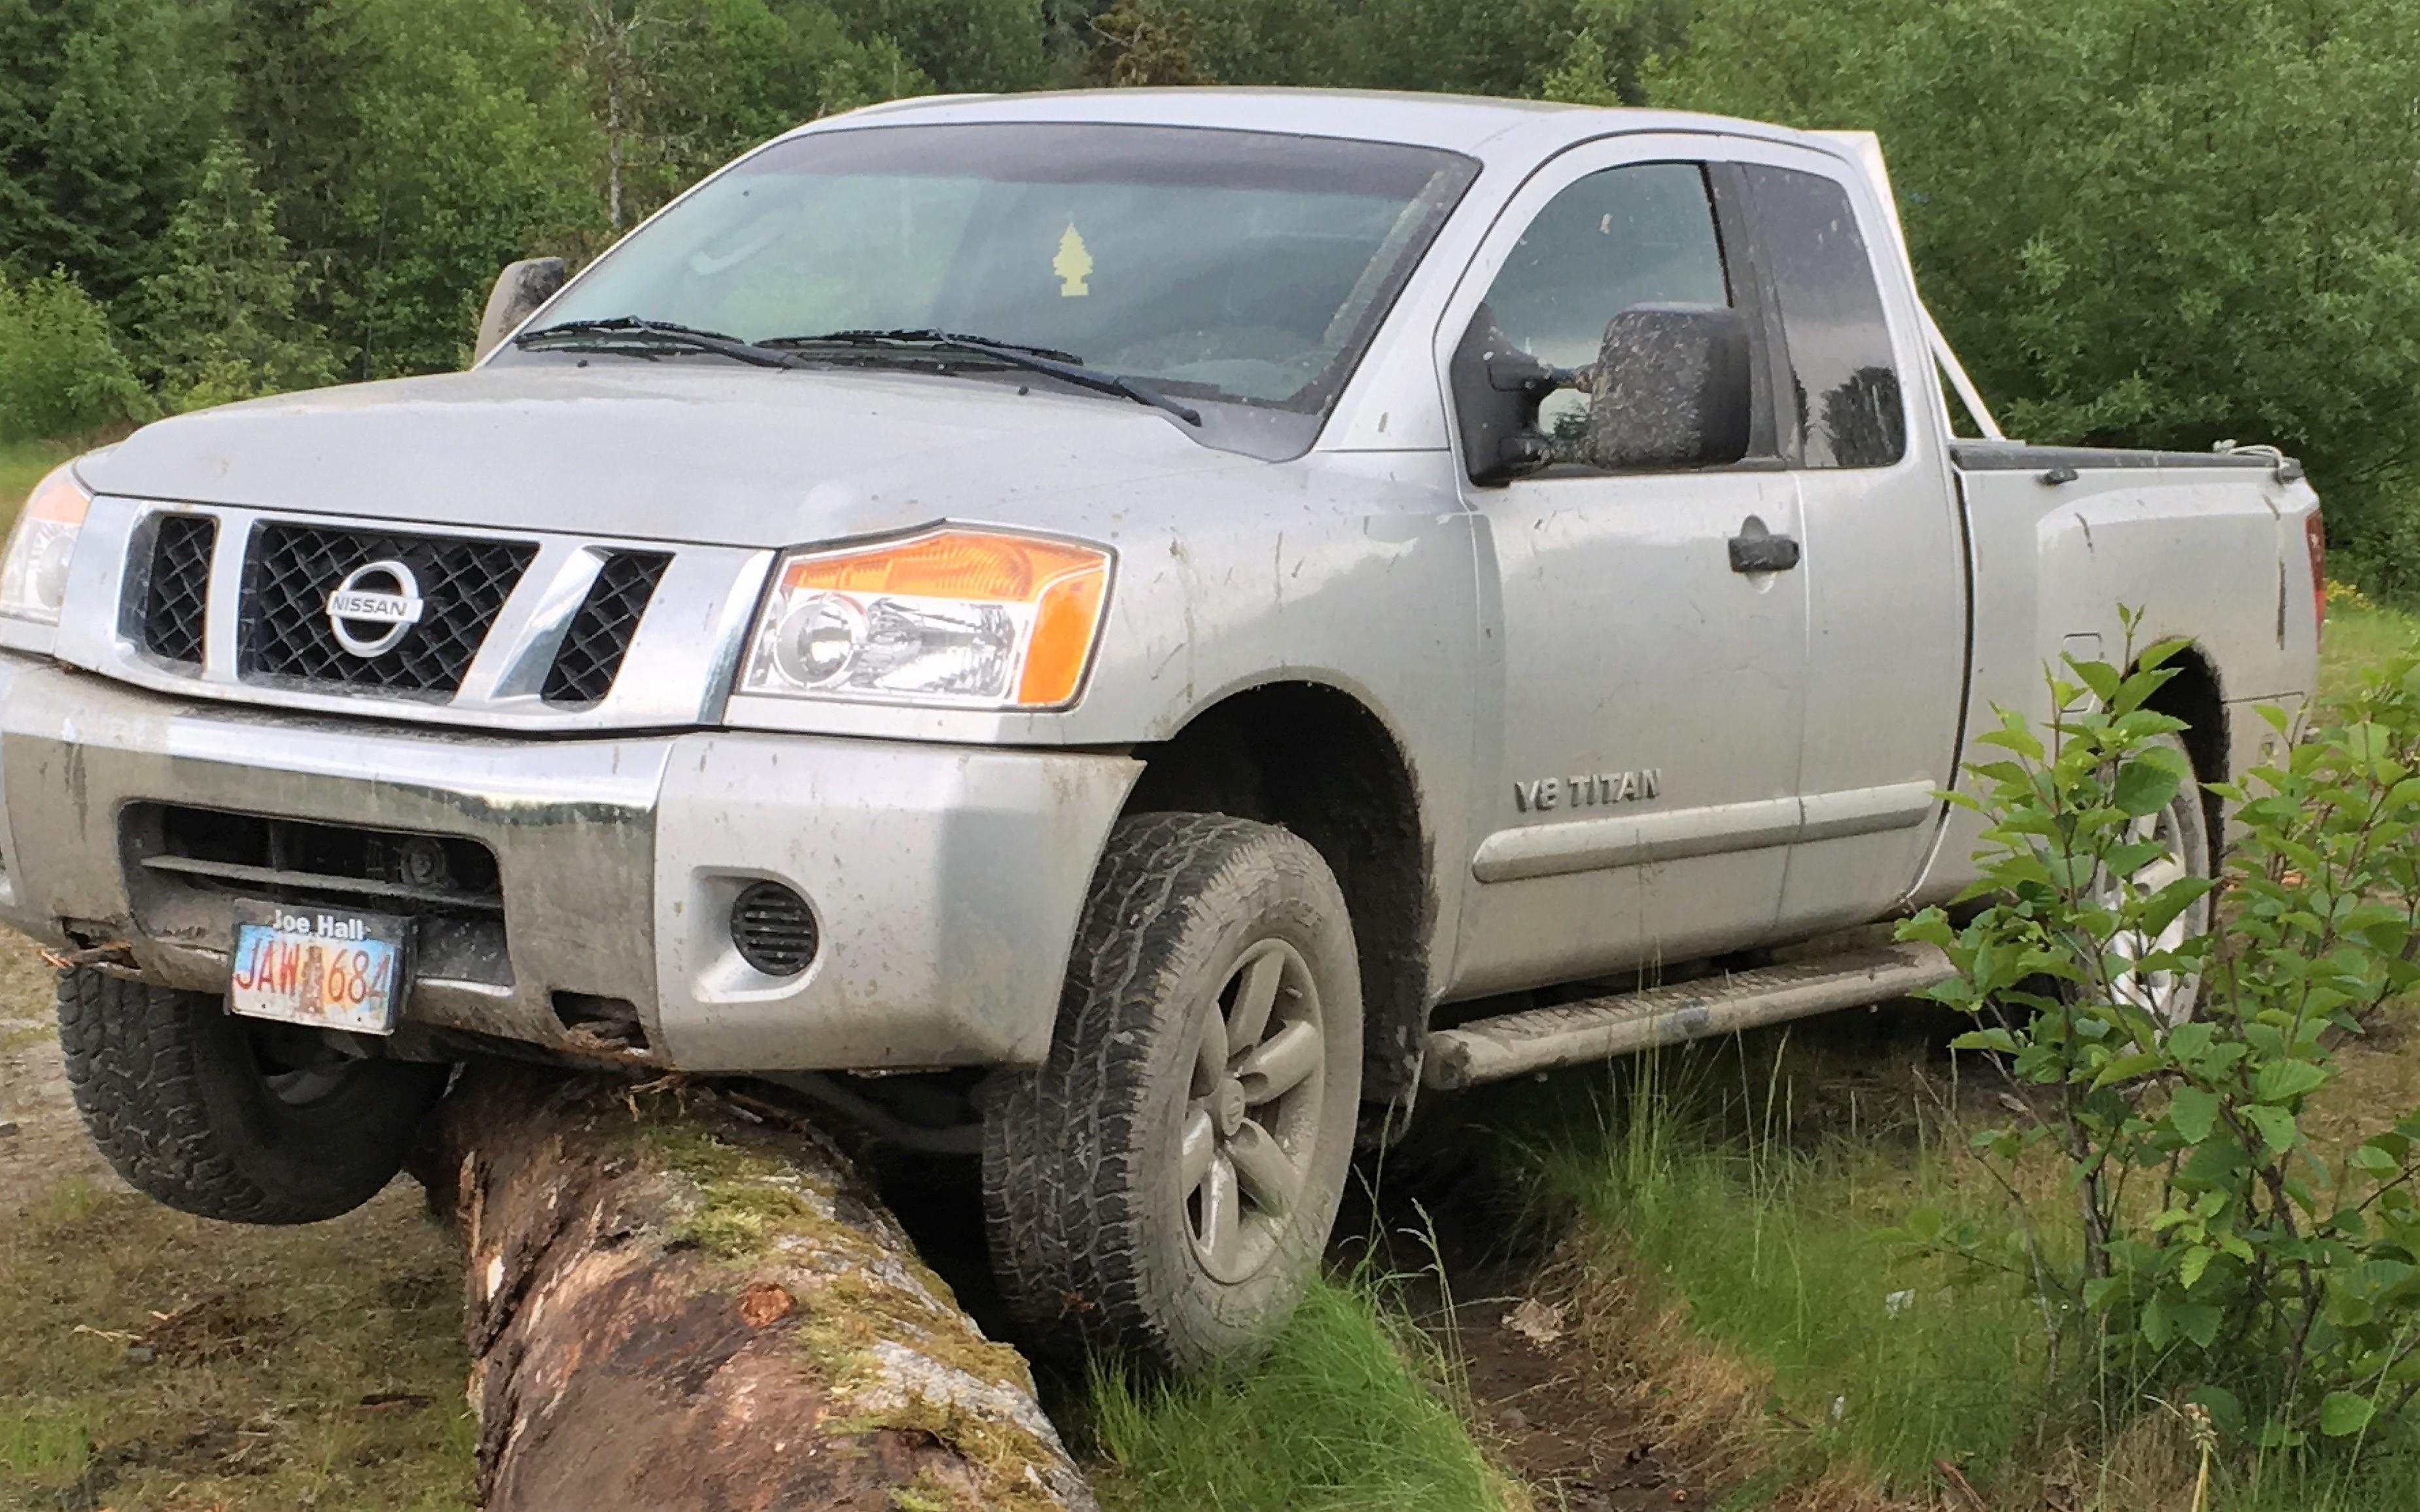 6-17-Cropped-Damaged-Wrangell-truck -Credit-Wrangell-Police